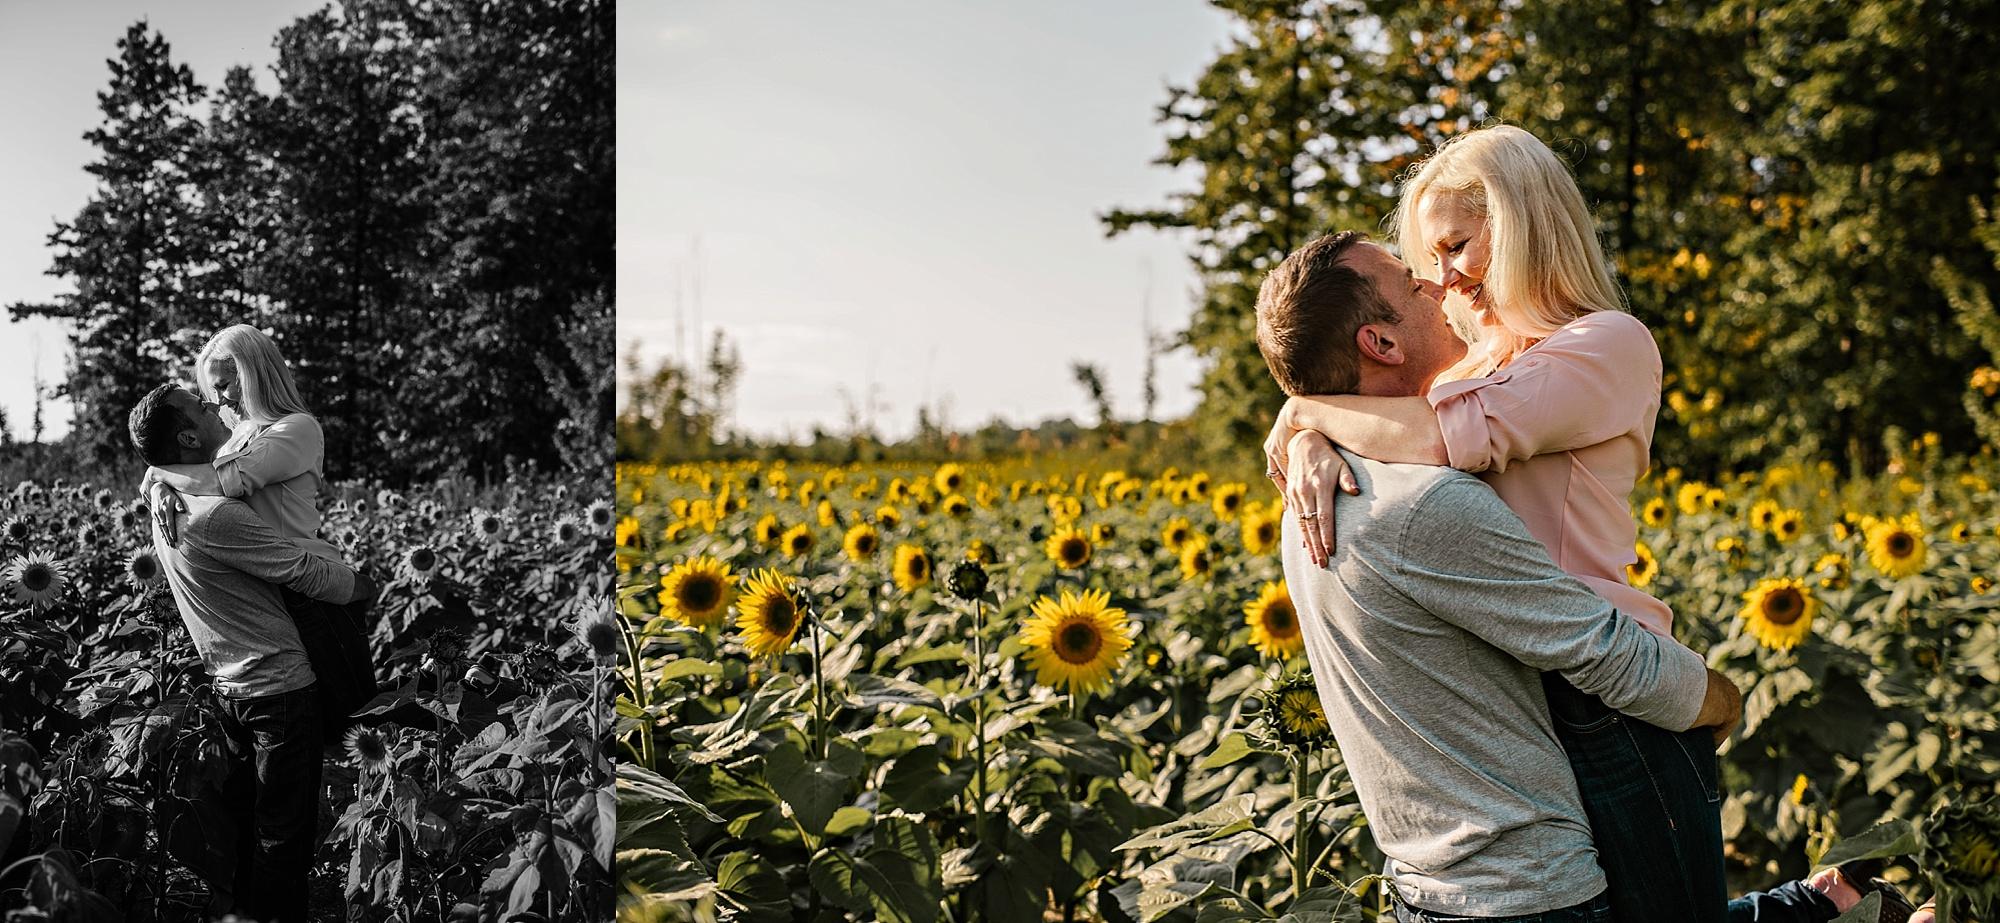 Lori-and-mike-akron-ohio-photographer-lauren-grayson-sunflower-field-session_0013.jpg